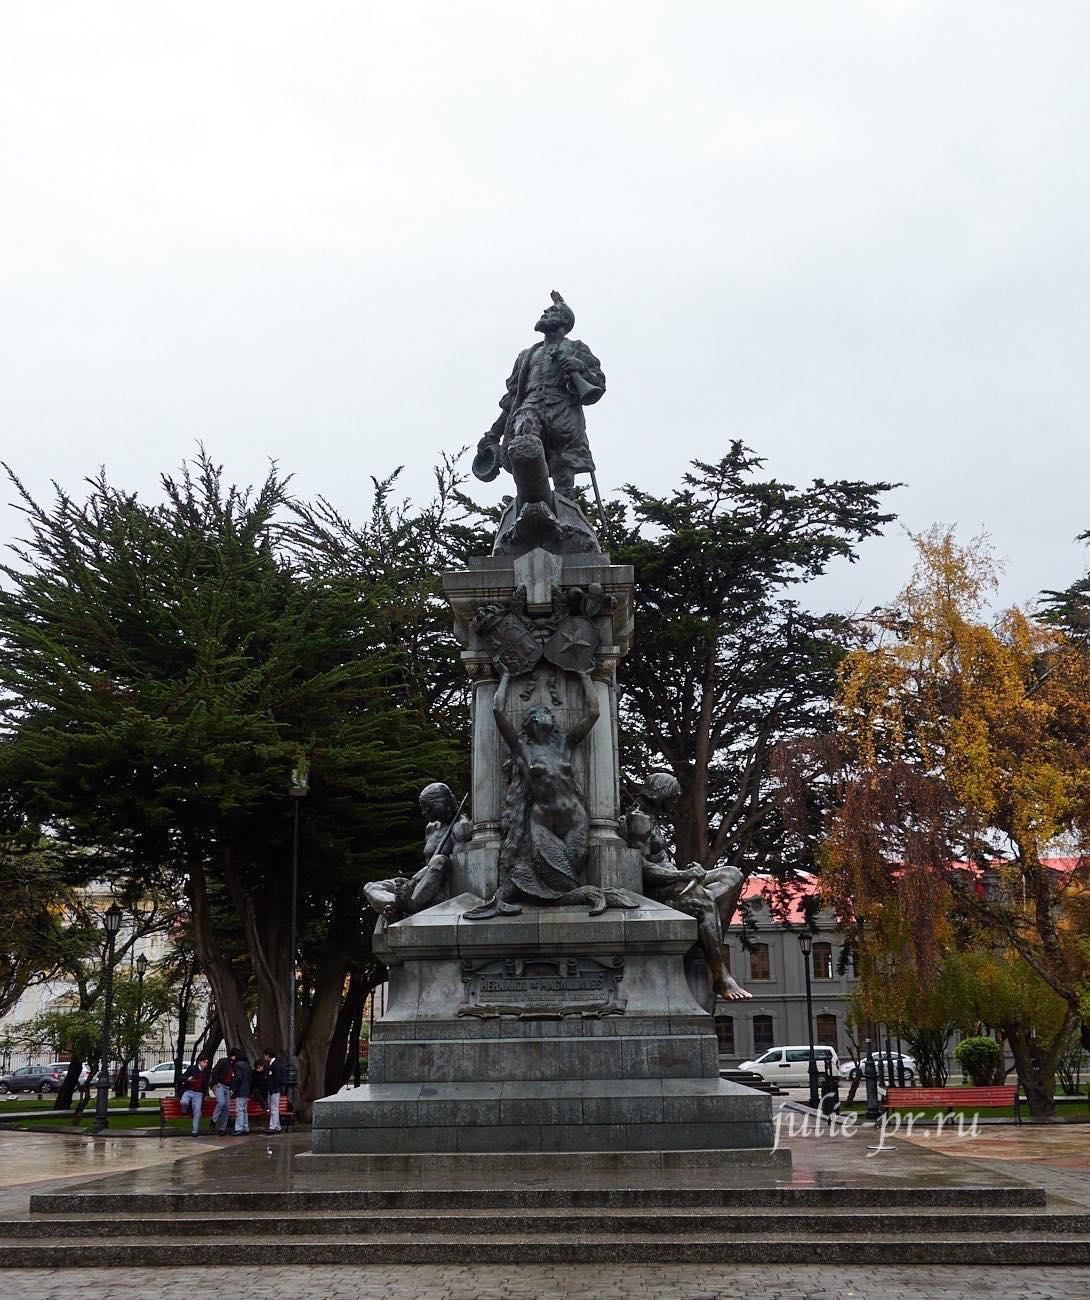 Чили, Патагония, Пунта-Аренас, Памятник Магеллану